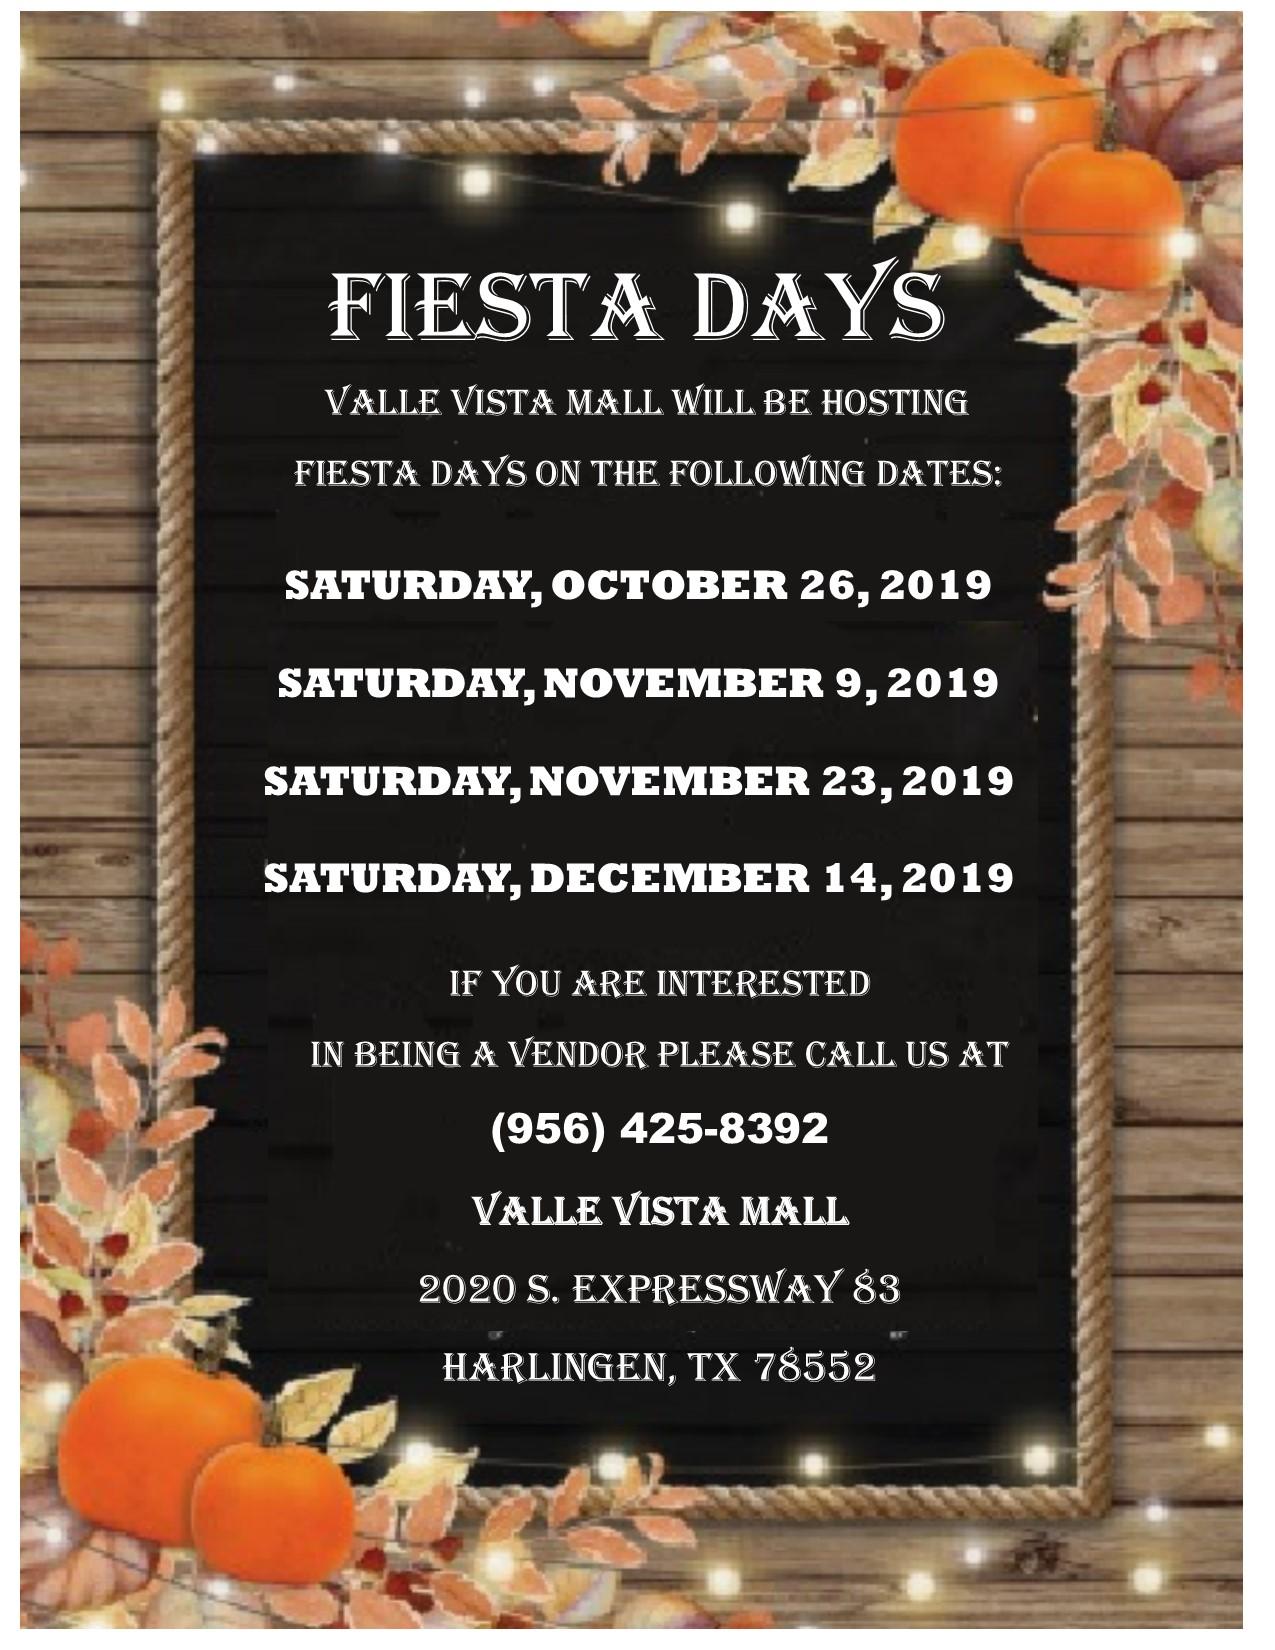 fall fiesta dates at valle vista